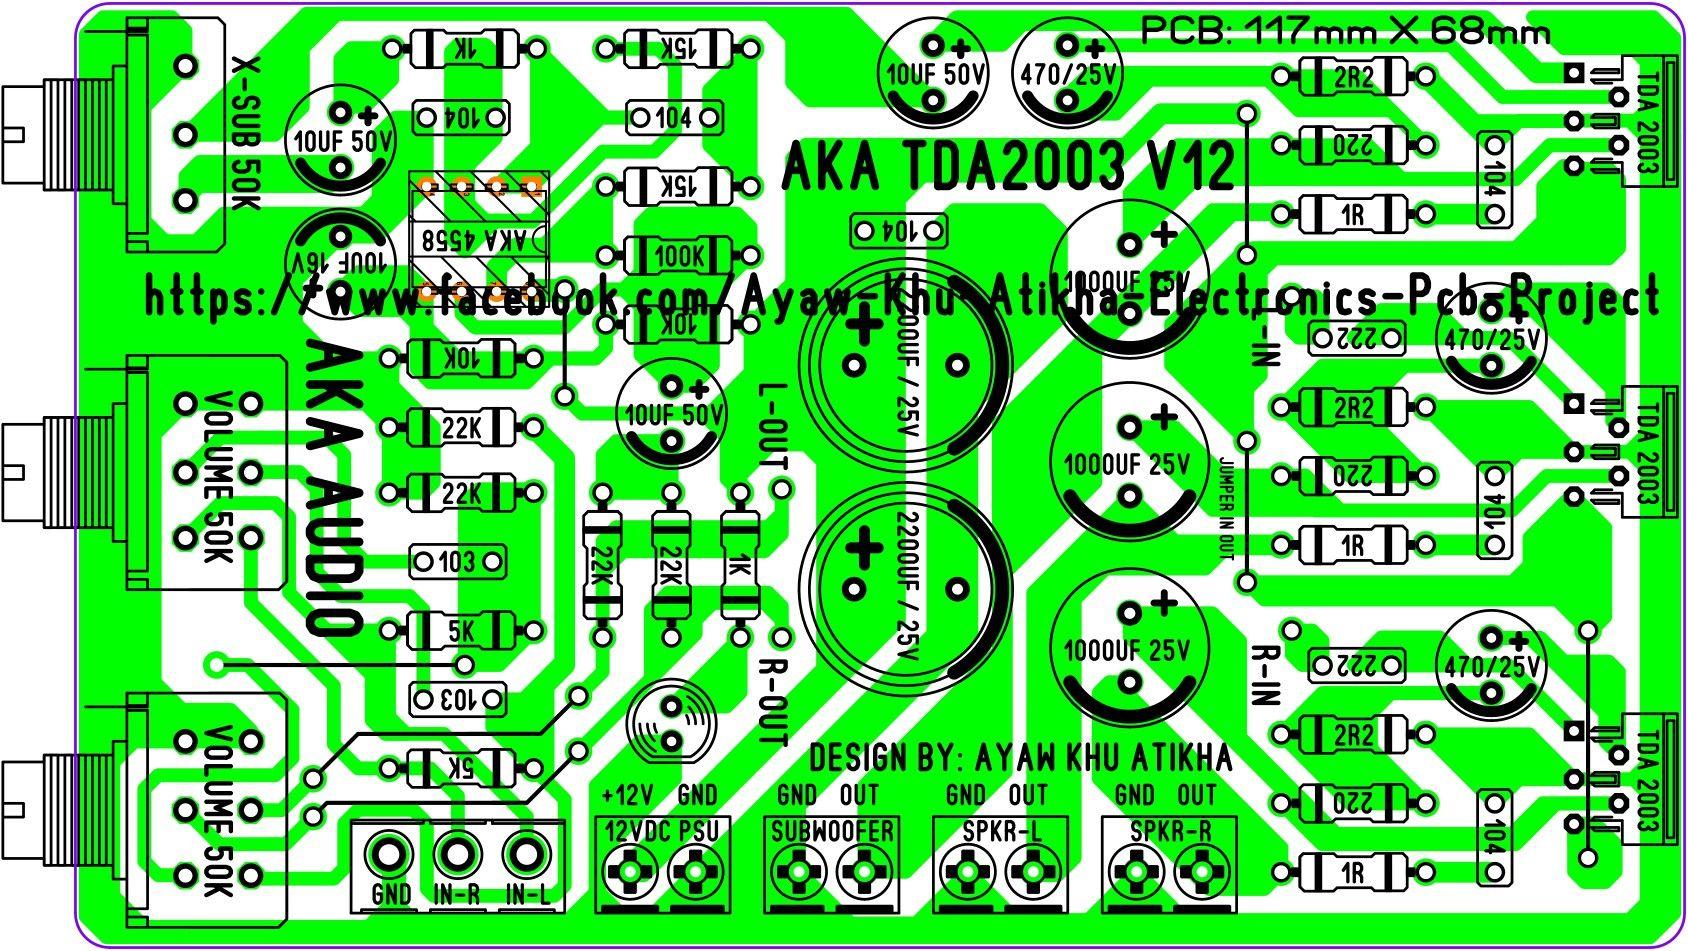 Aka Tda2003 Car Amp New Design Ayaw Khu Atikha In 2019 News Class B Audio Amplifier 15w By Ne5532 Transistor